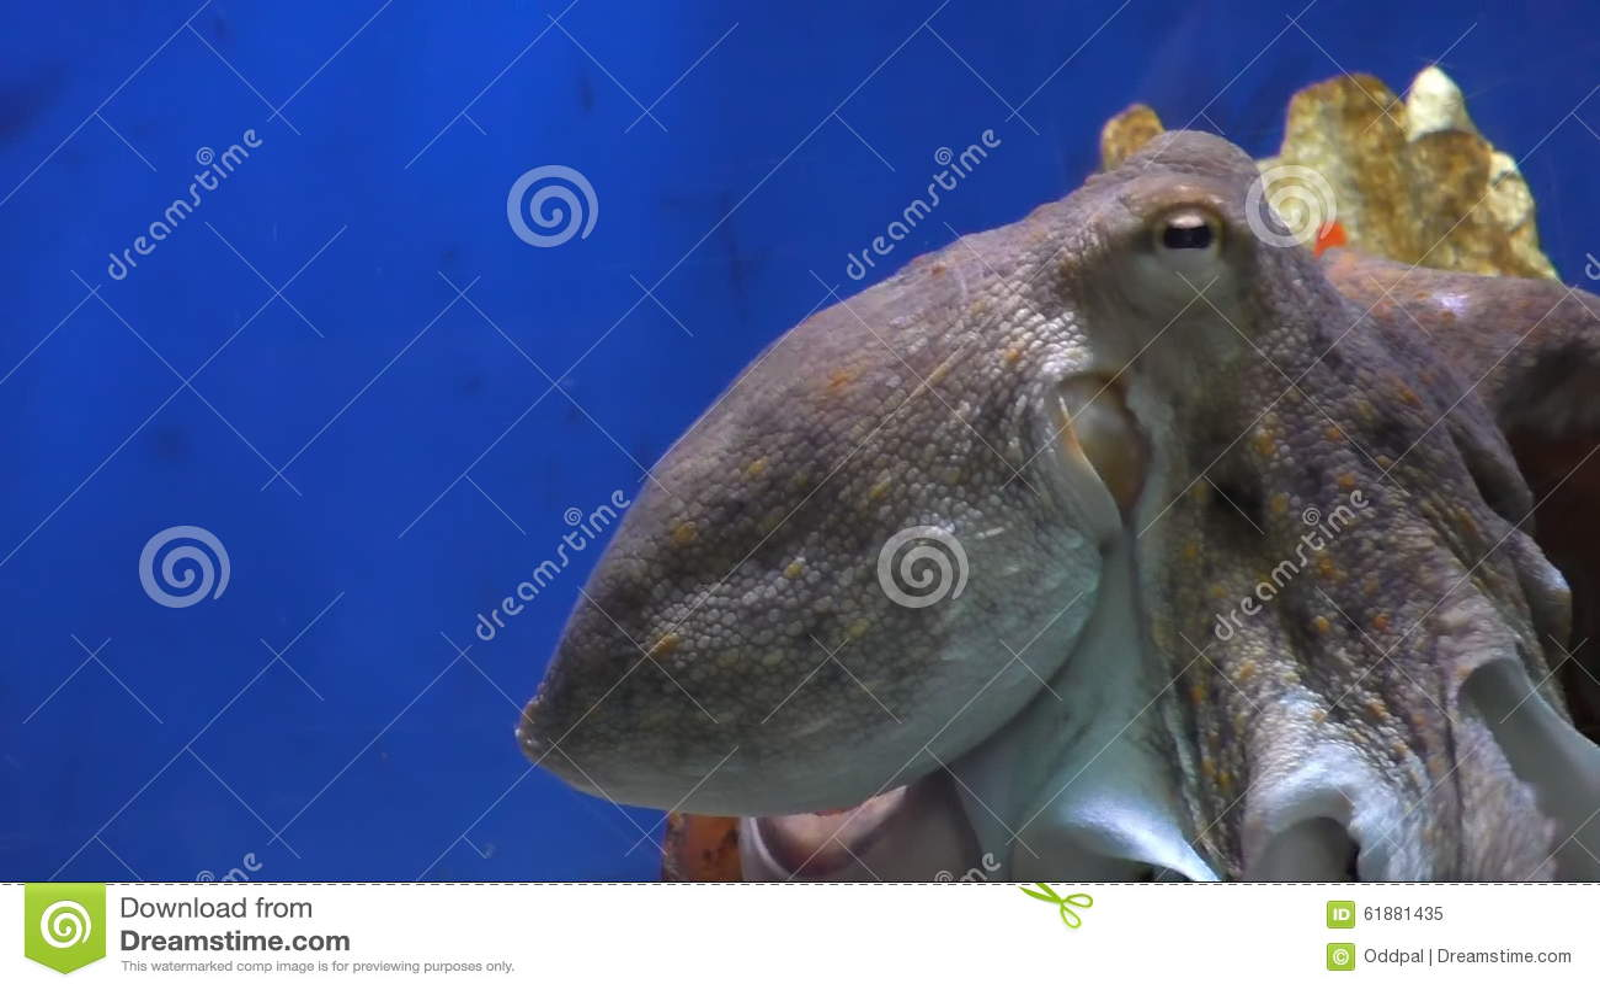 Fish in tank swimming at top - Fish In Tank Swimming At Top